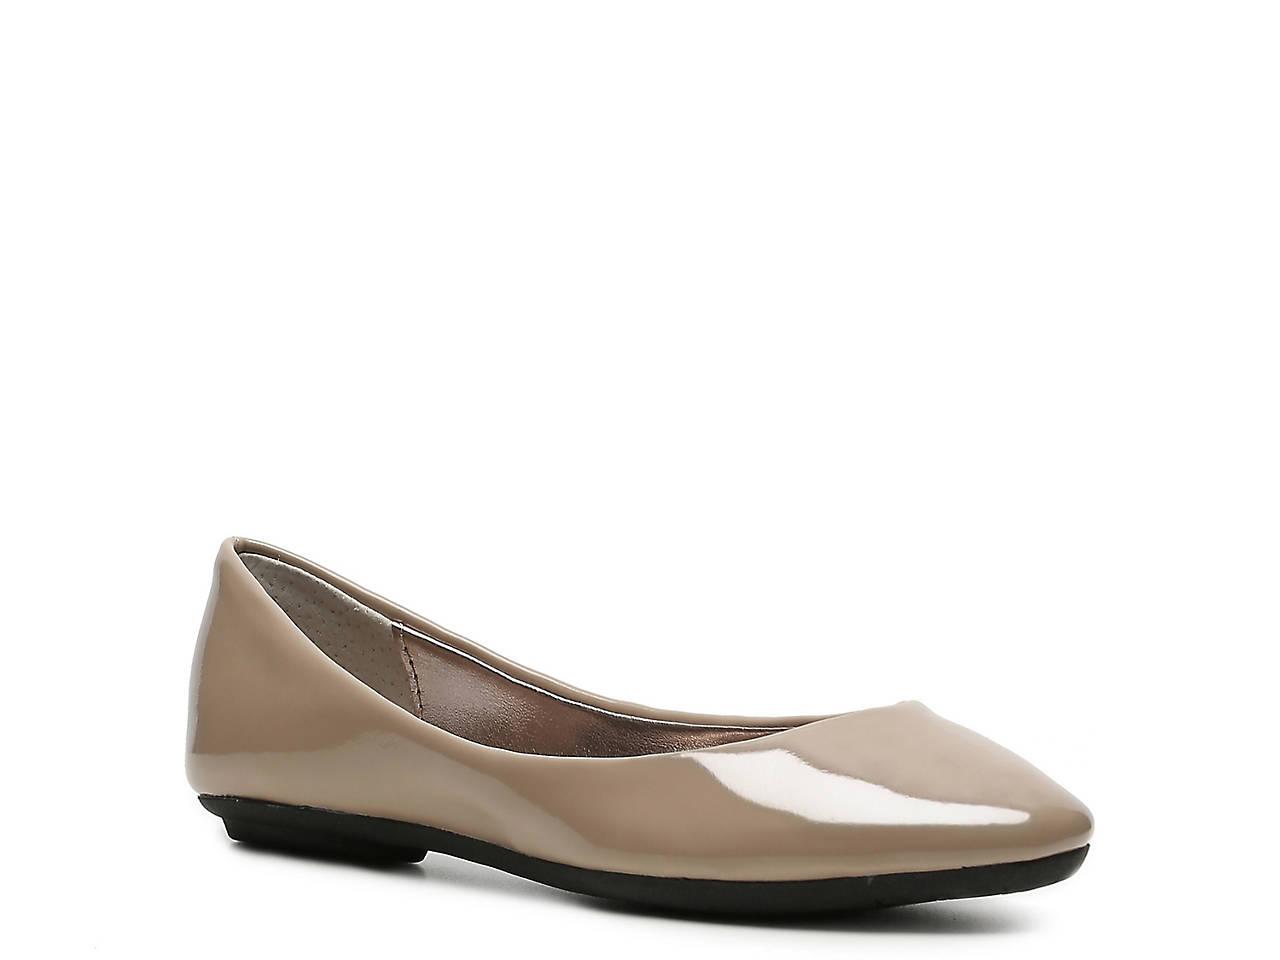 cc01bf440b5 Steve Madden Heaven Patent Ballet Flat Women s Shoes